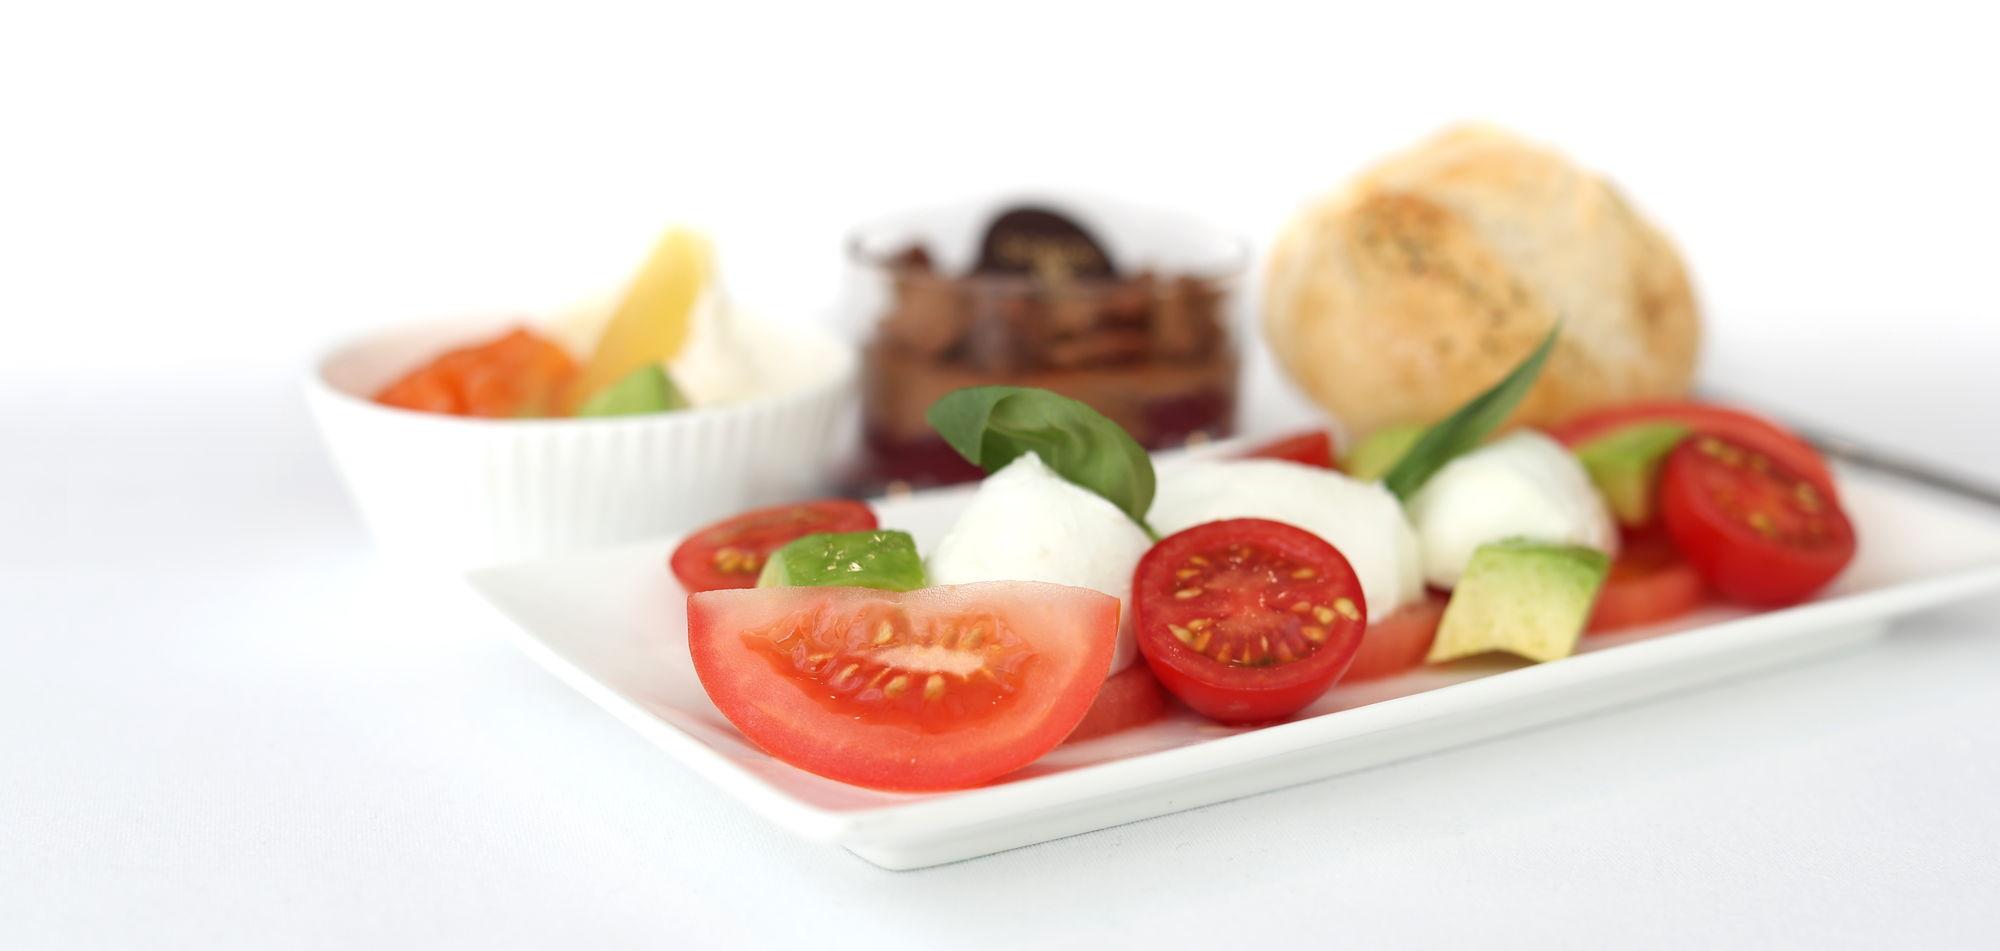 Club Europe catering | menus, reviews and photos - FlyerTalk